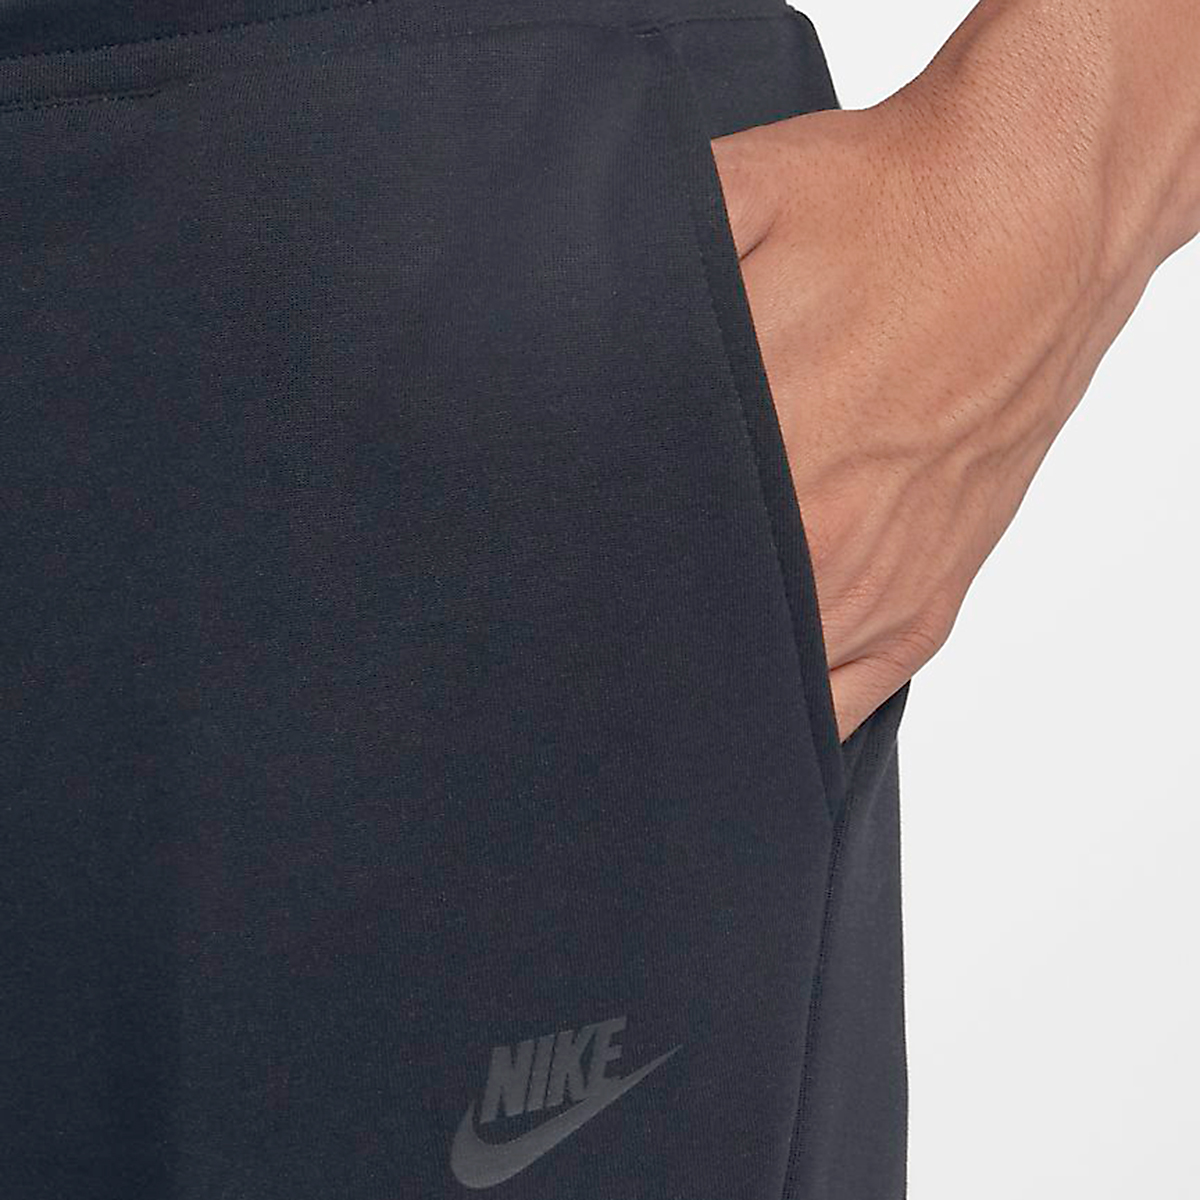 Men's Nike Tech Fleece Jogger  - Color: Black - Size: S, Black, large, image 4